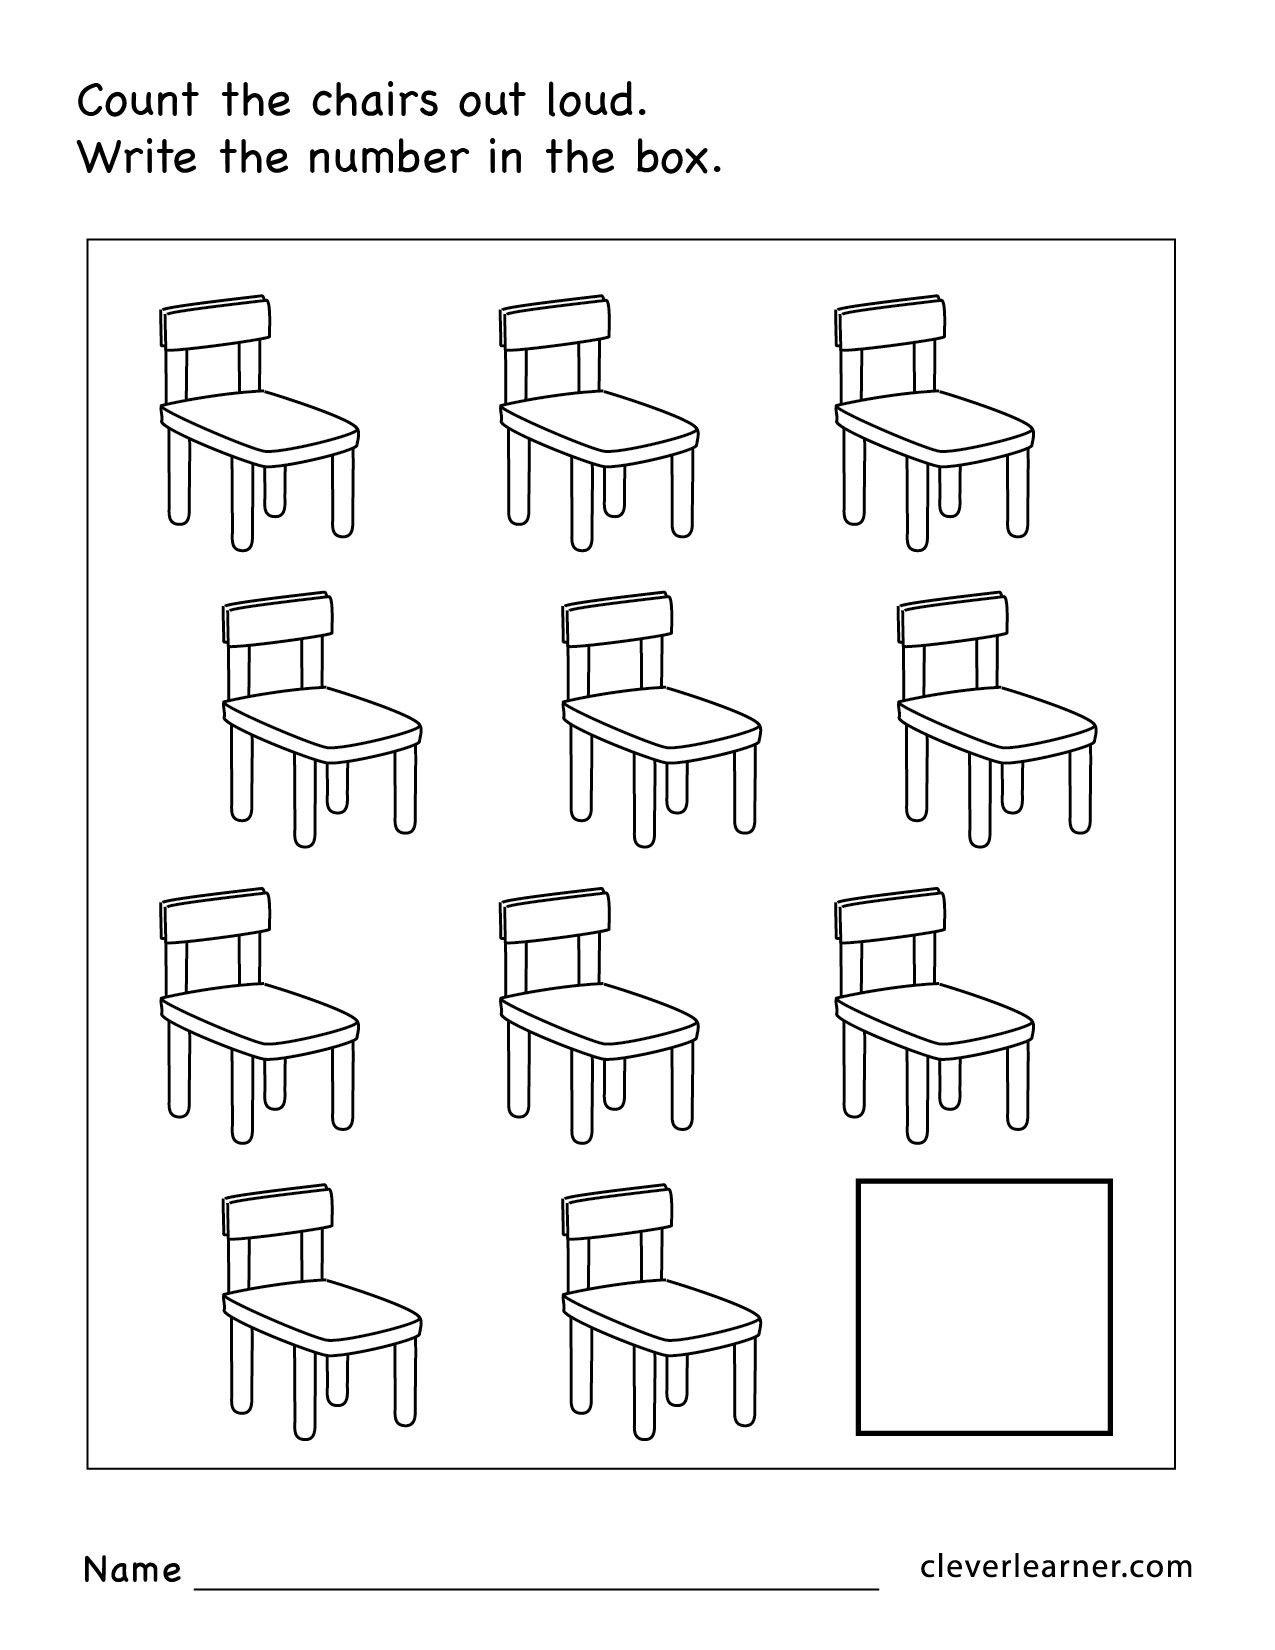 Free Preschool Kindergarten Worksheets Counting Number Recognition 4 In 2020 Kindergarten Worksheets Letter Worksheets For Preschool Printable Preschool Worksheets